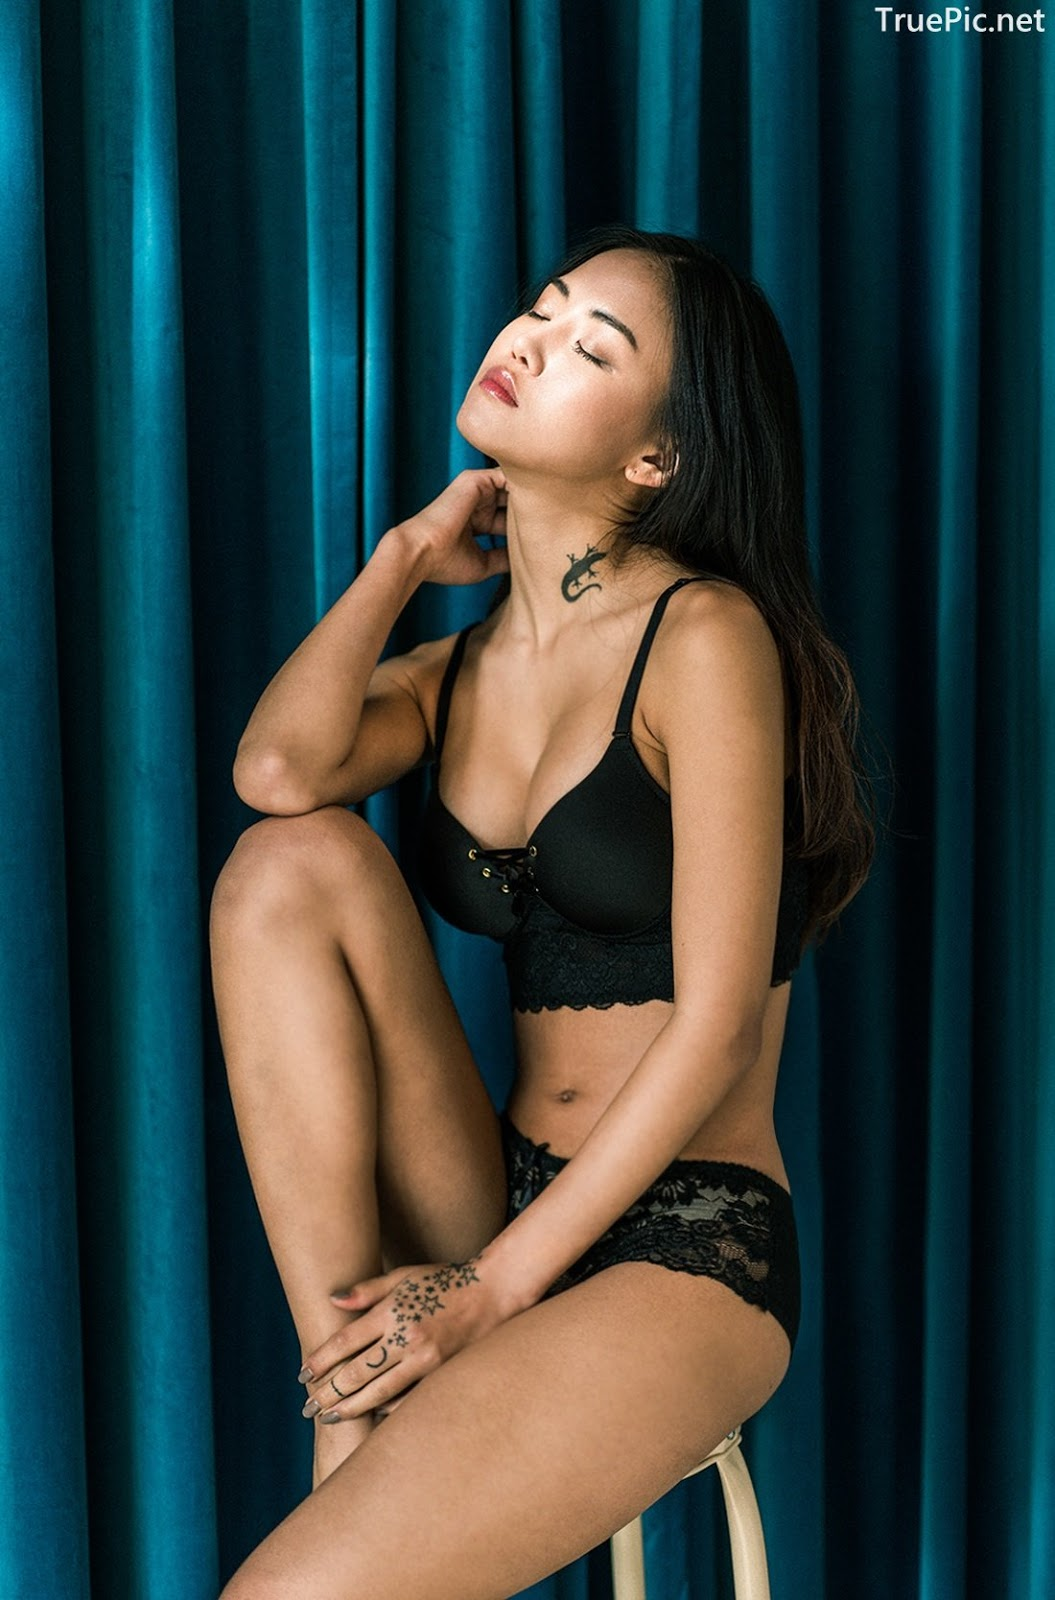 Image-Korean-Fashion-Model–Baek-Ye-Jin–Sexy-Lingerie-Collection-2-TruePic.net- Picture-1